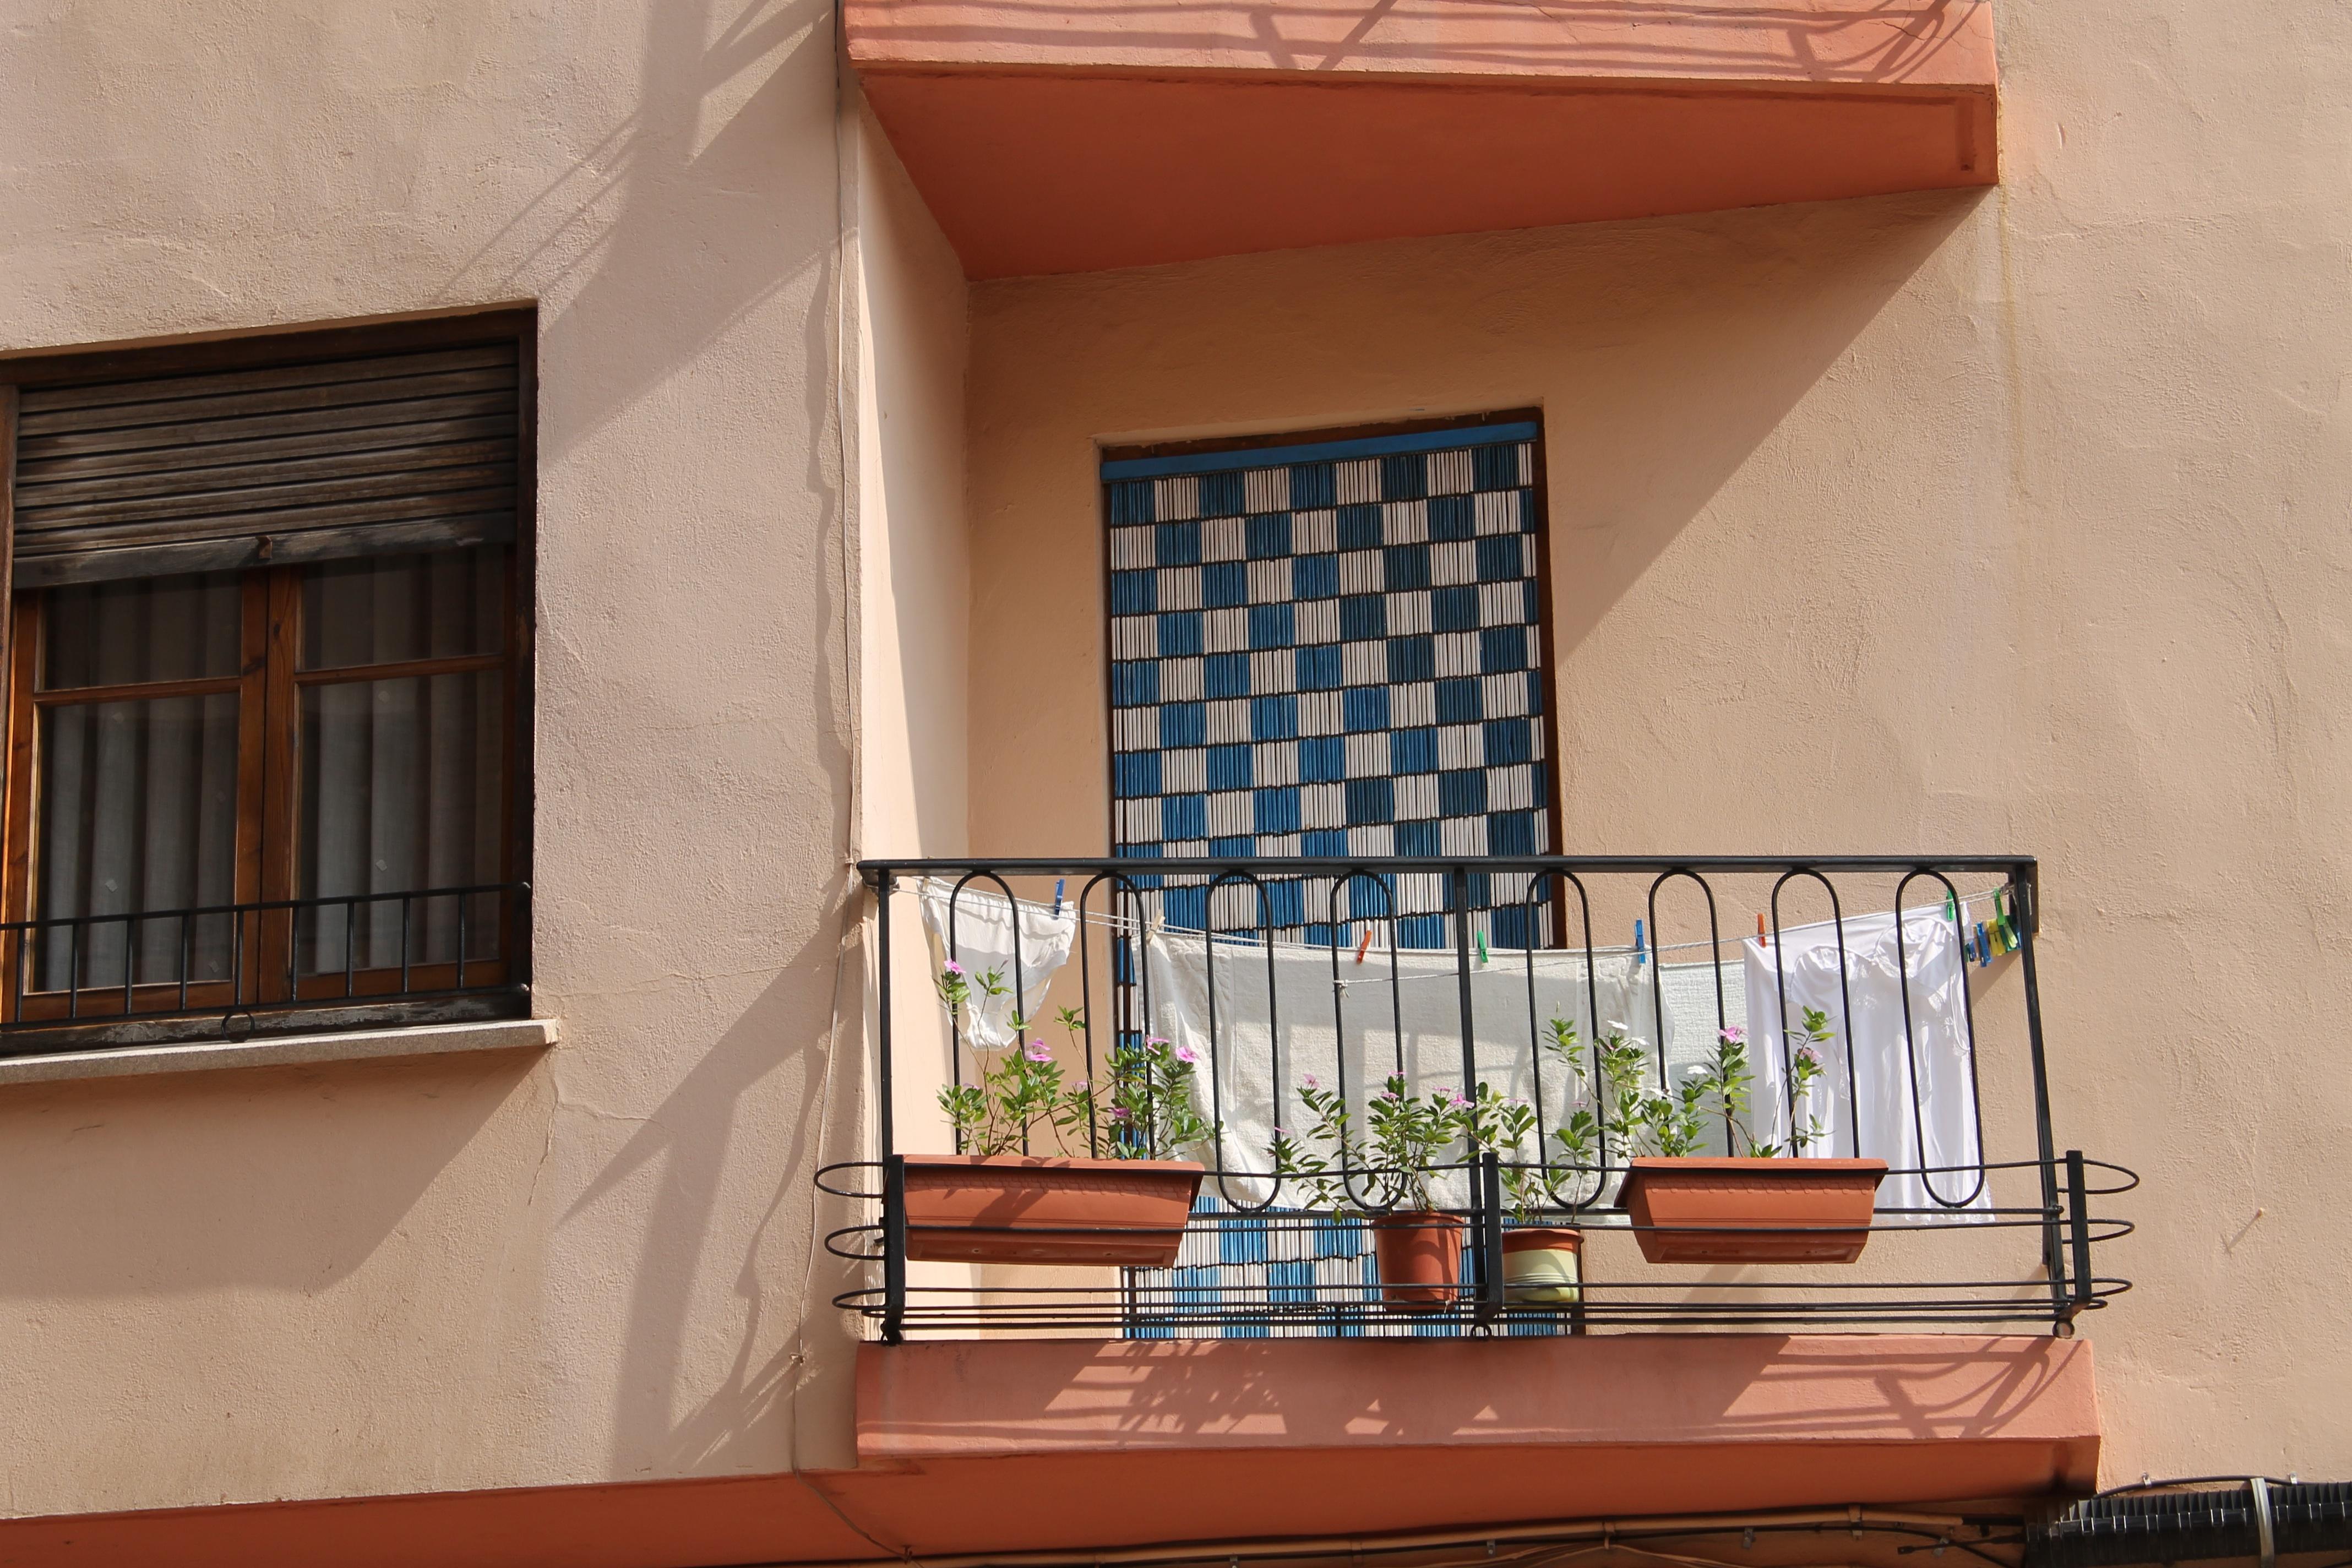 Картинки : архитектура, дерево, дом, окно, главная, балкон, .